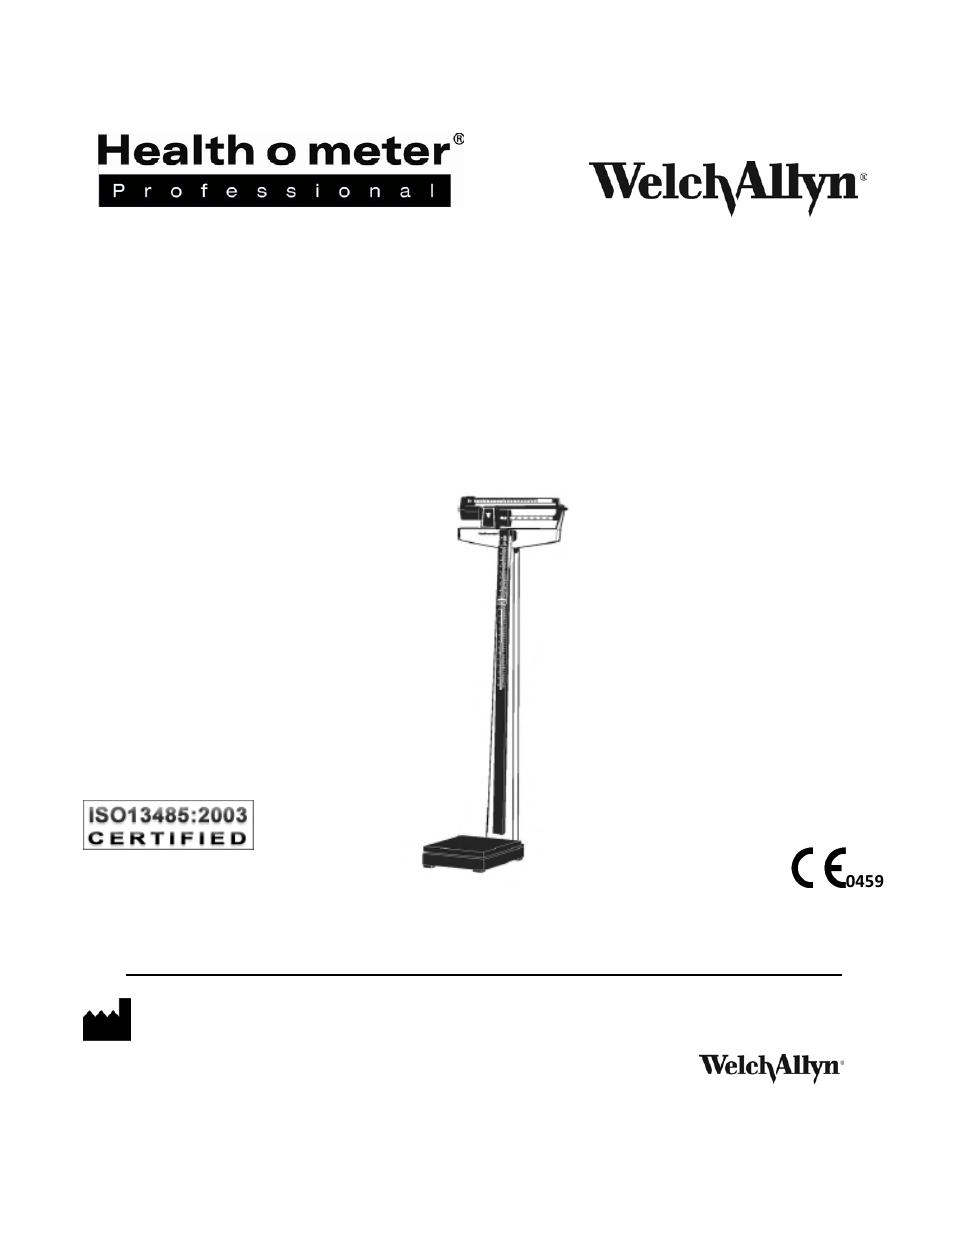 Welch Allyn 402klwa Health O Meter Professional Physicians Beam